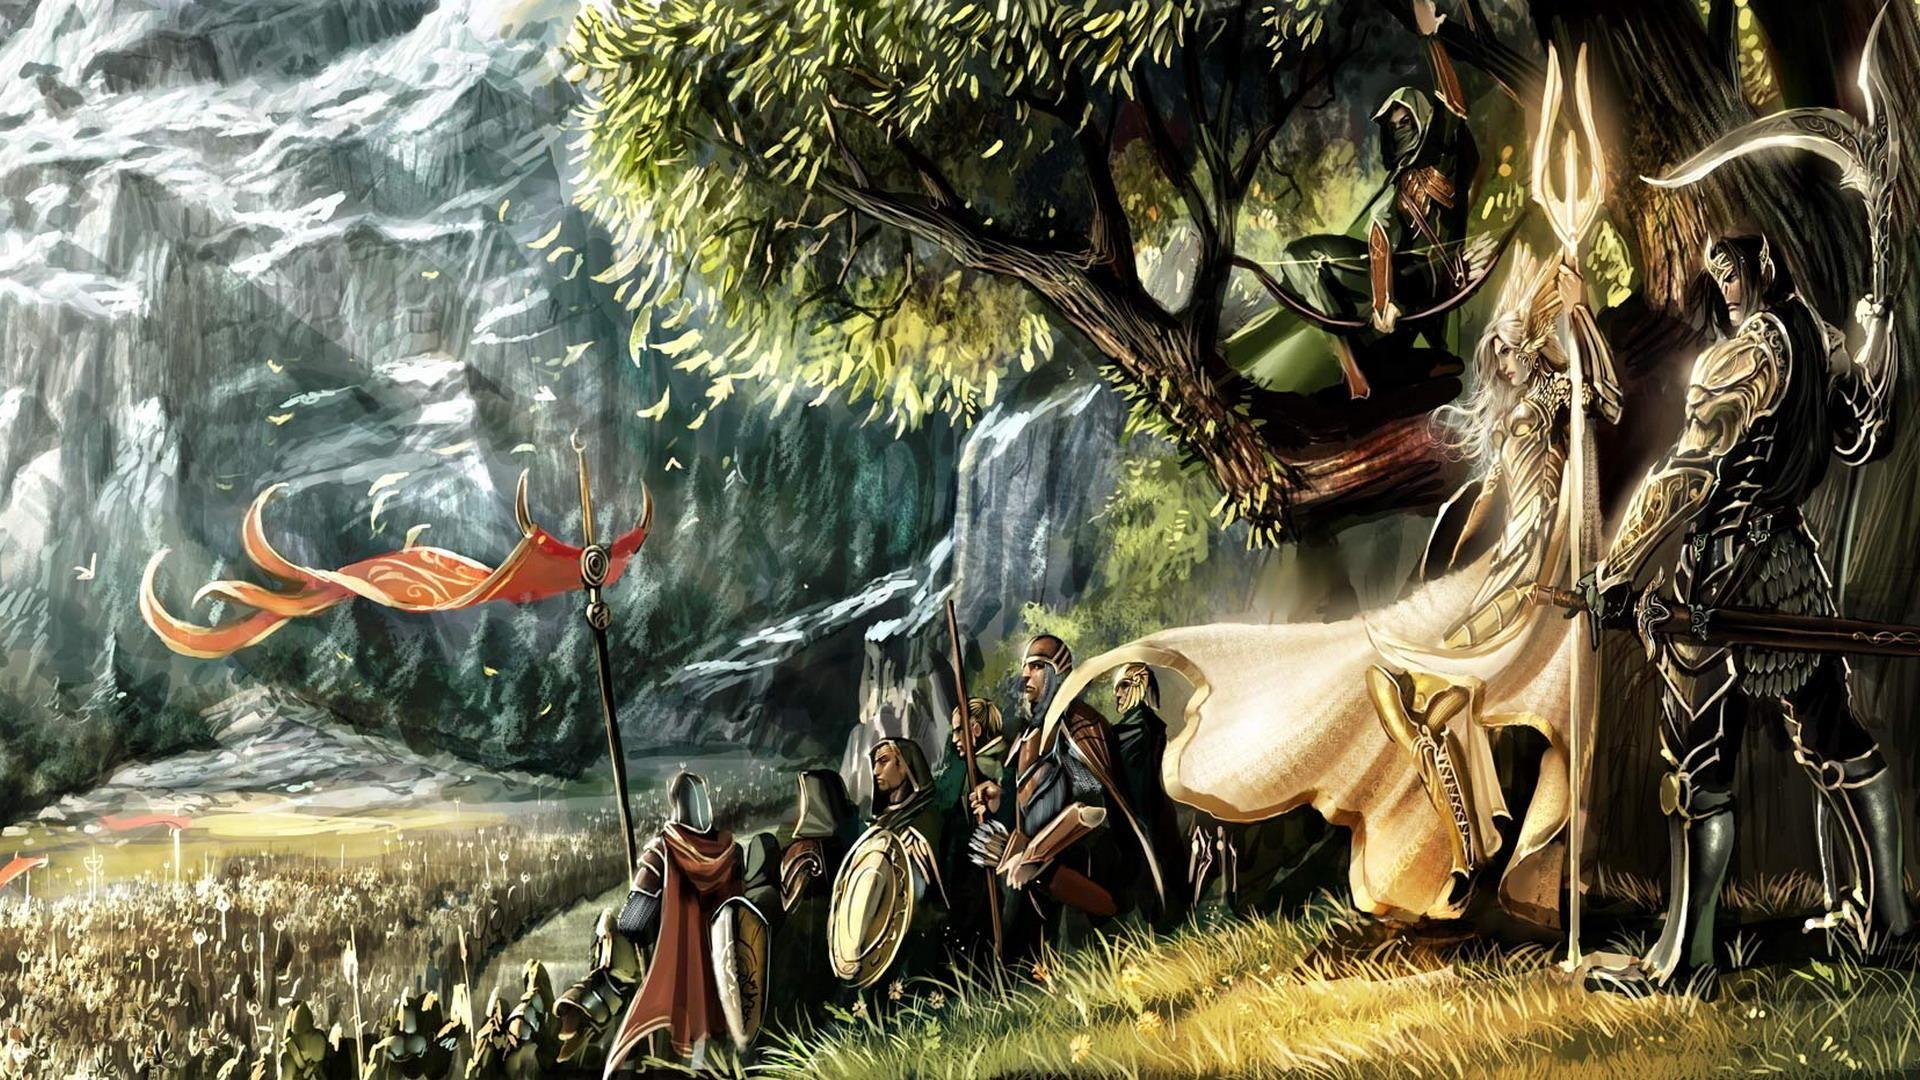 Traveling Elves Hd Wallpaper Get It Now Warriors Wallpaper Fantasy Pictures Wallpaper Backgrounds